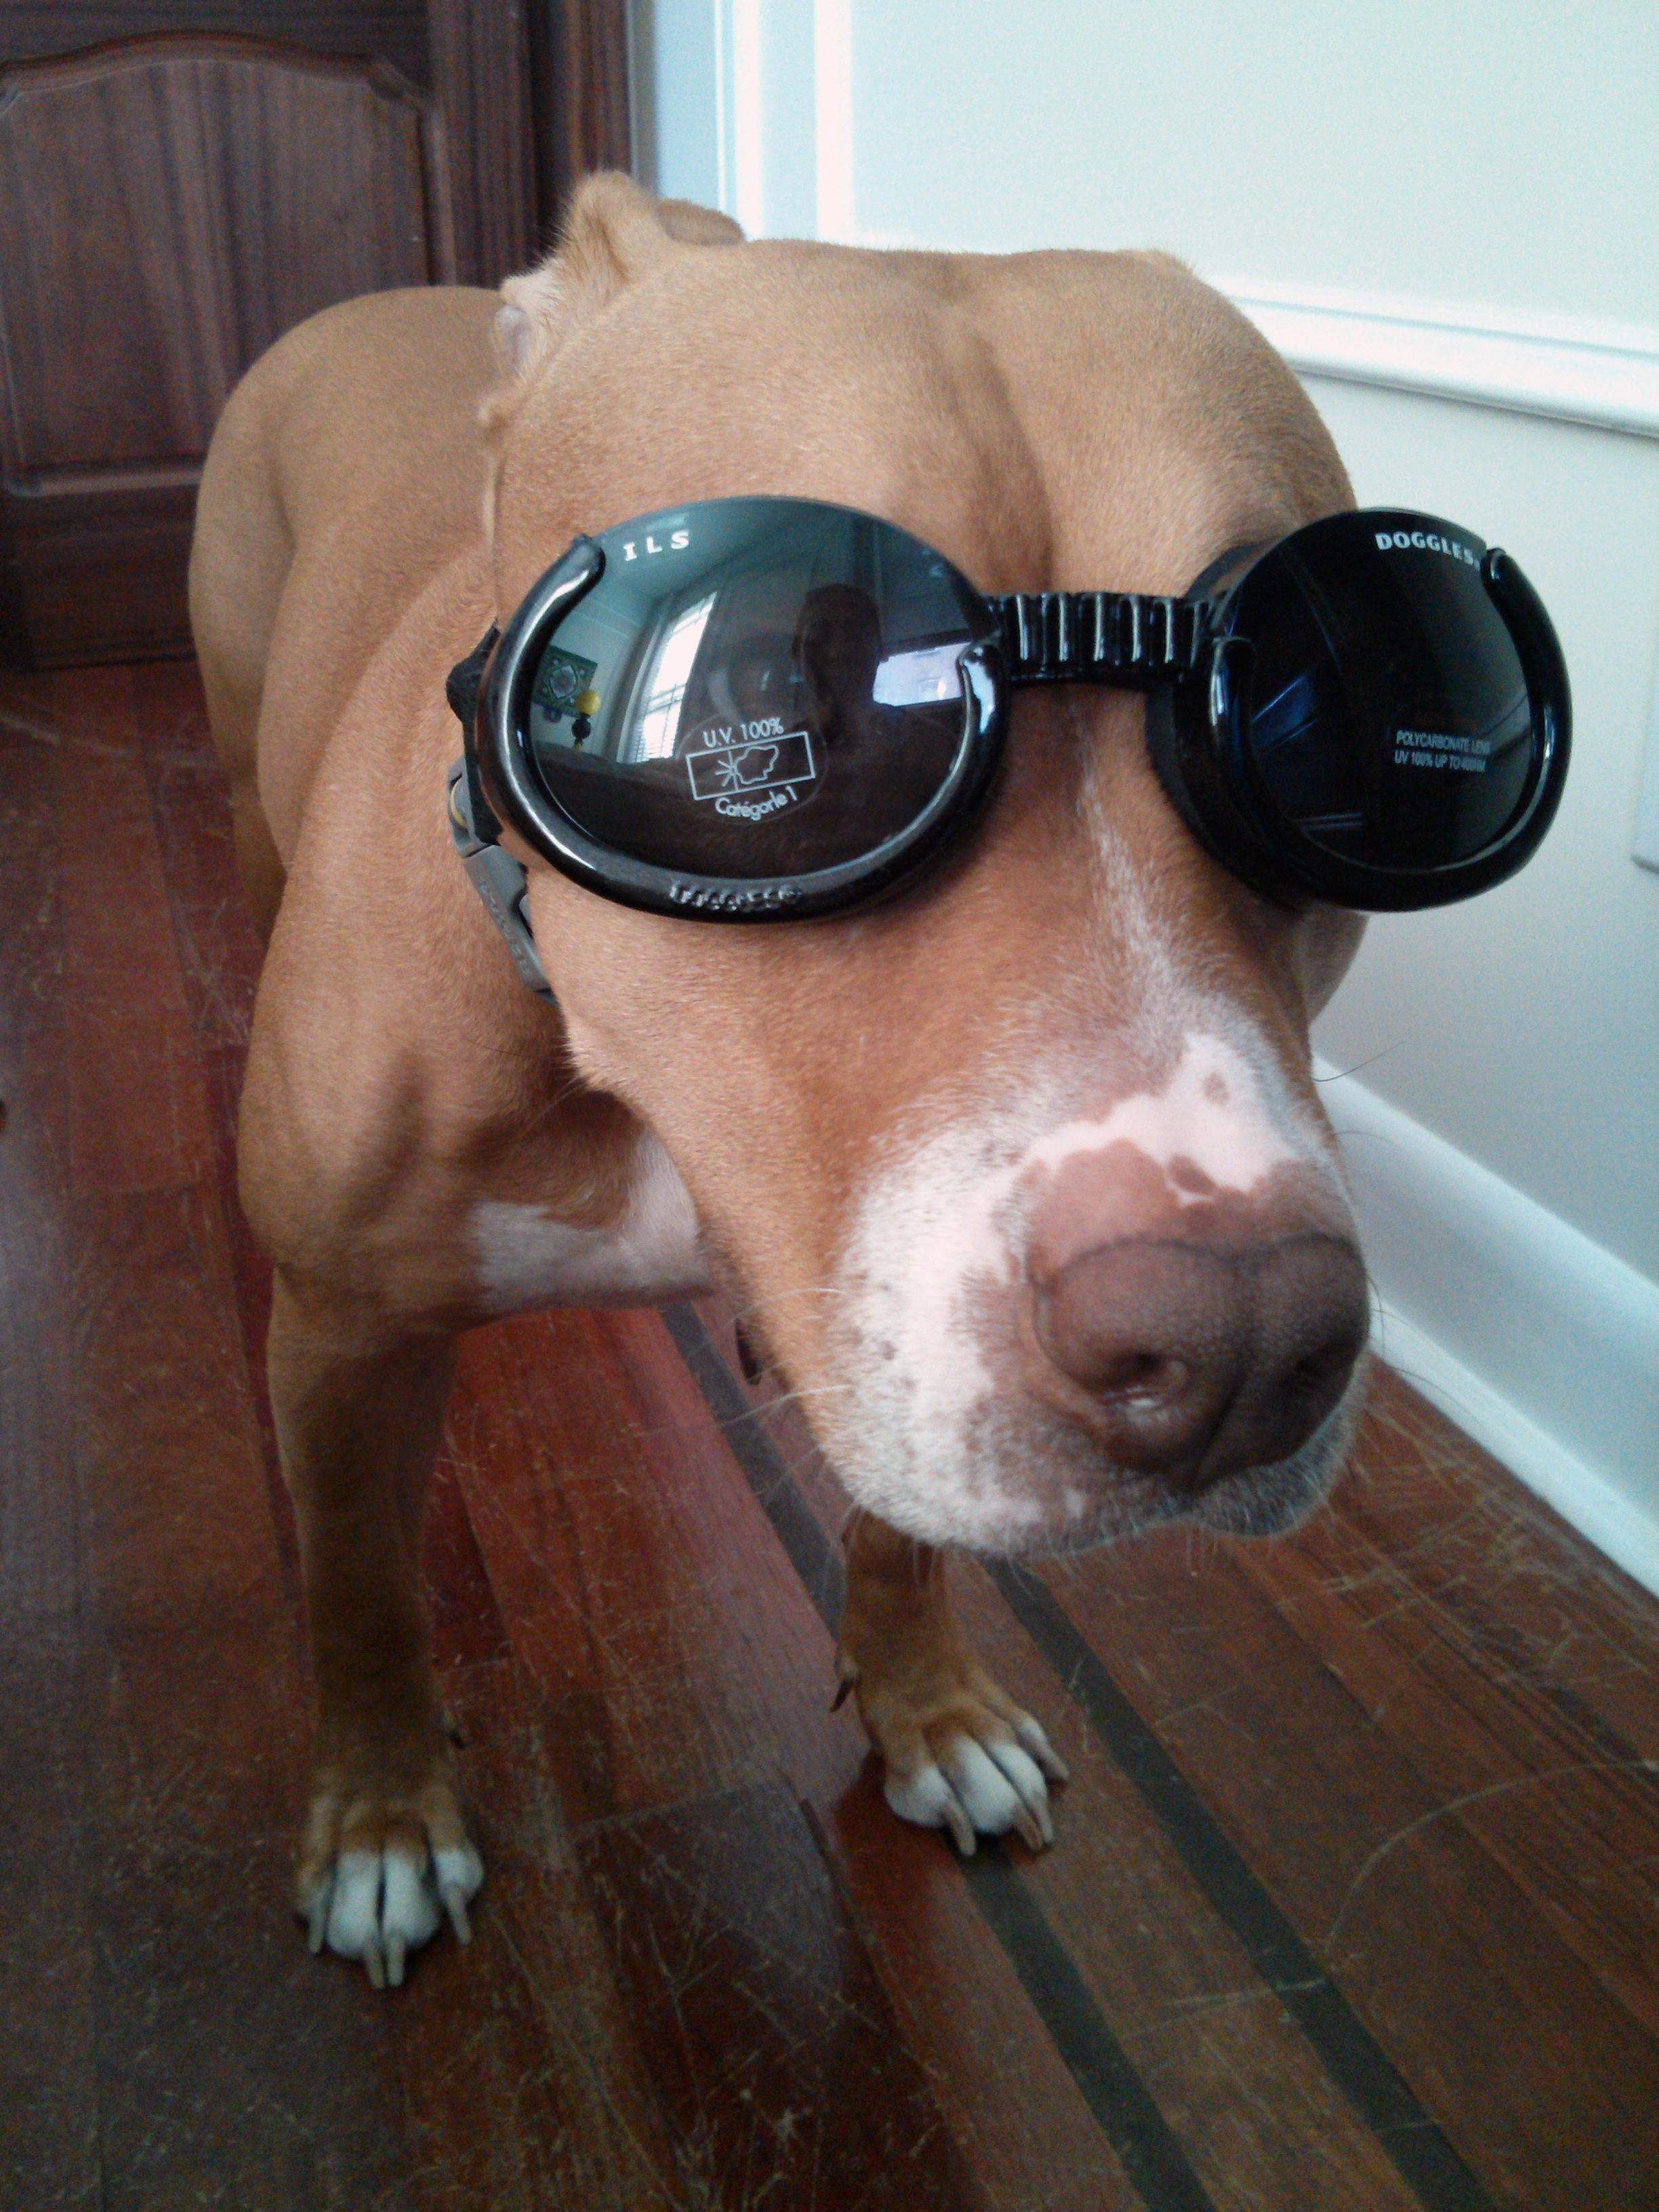 trinket_olive-wearing-doggles.jpg